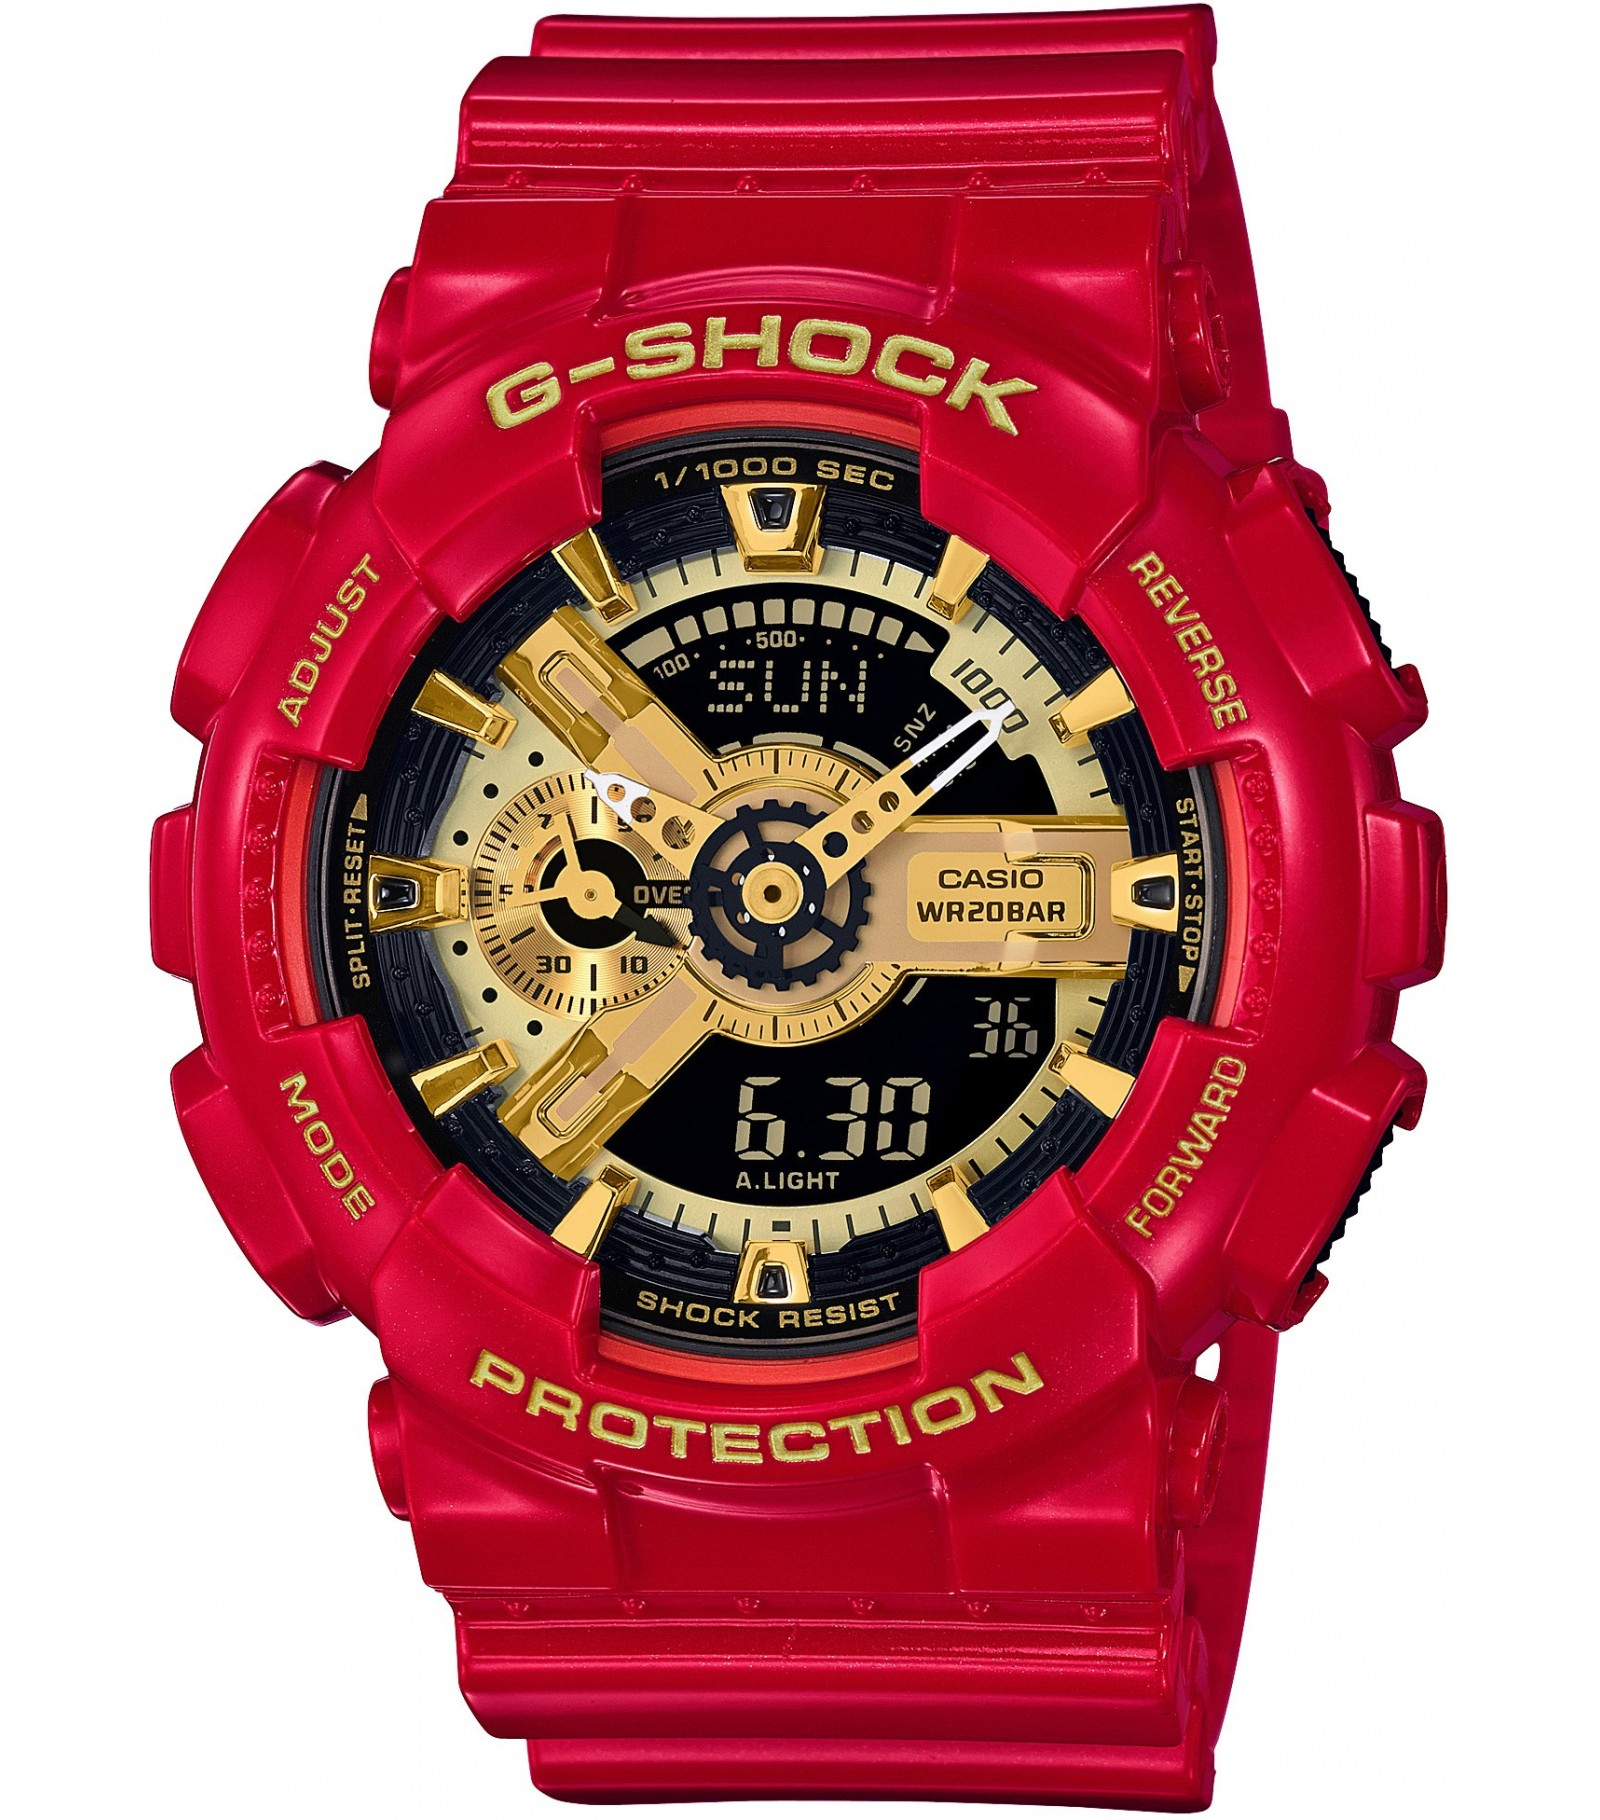 Наручные часы Casio G-Shock - купить наручные часы Casio G